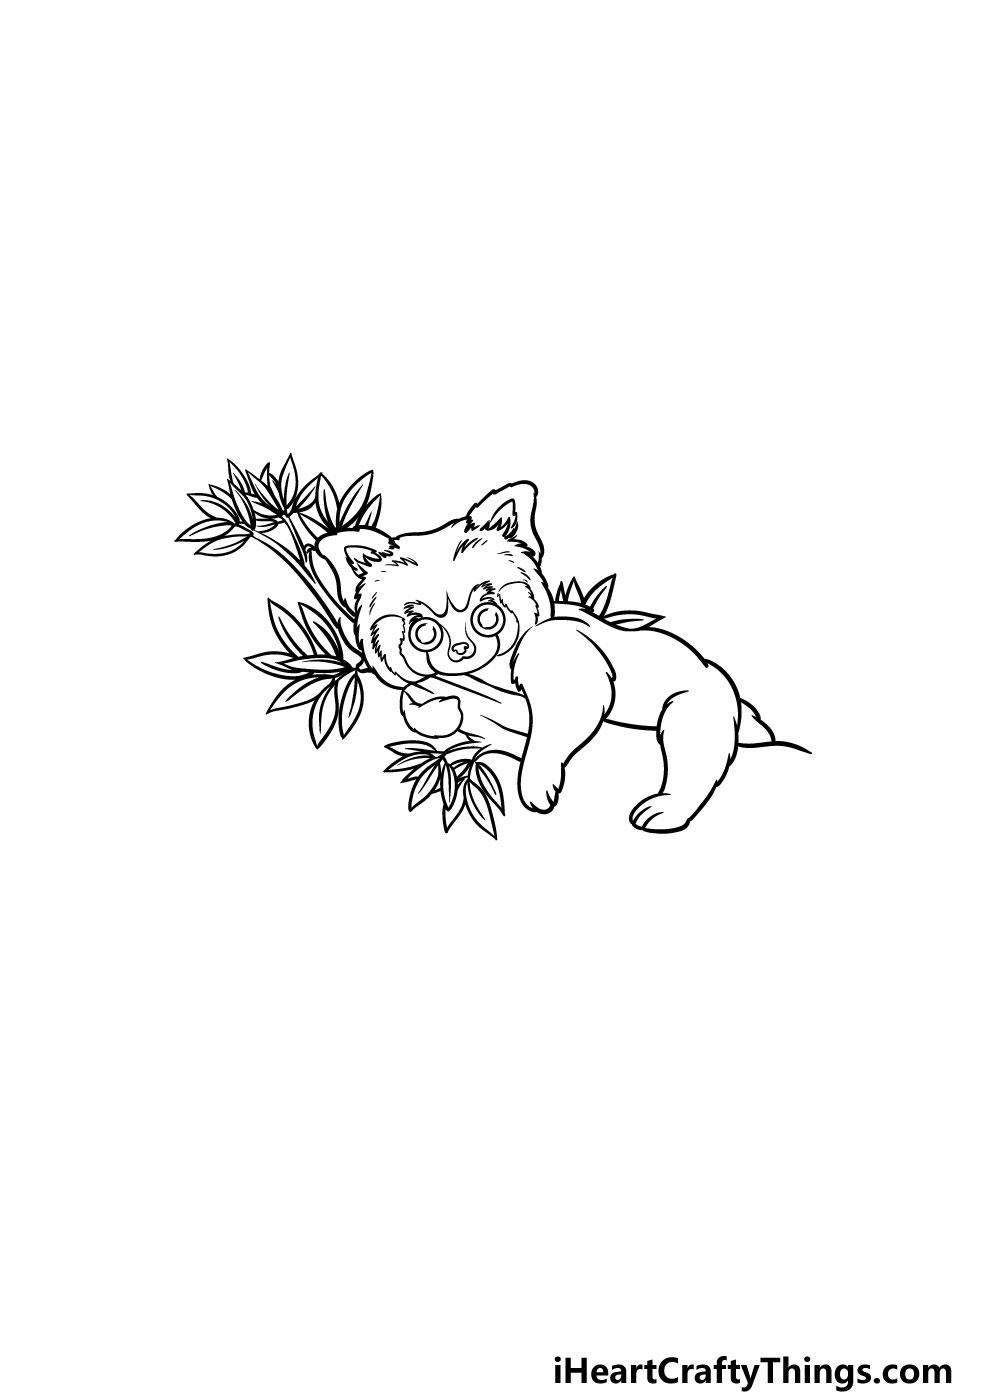 drawing a Red Panda step 4